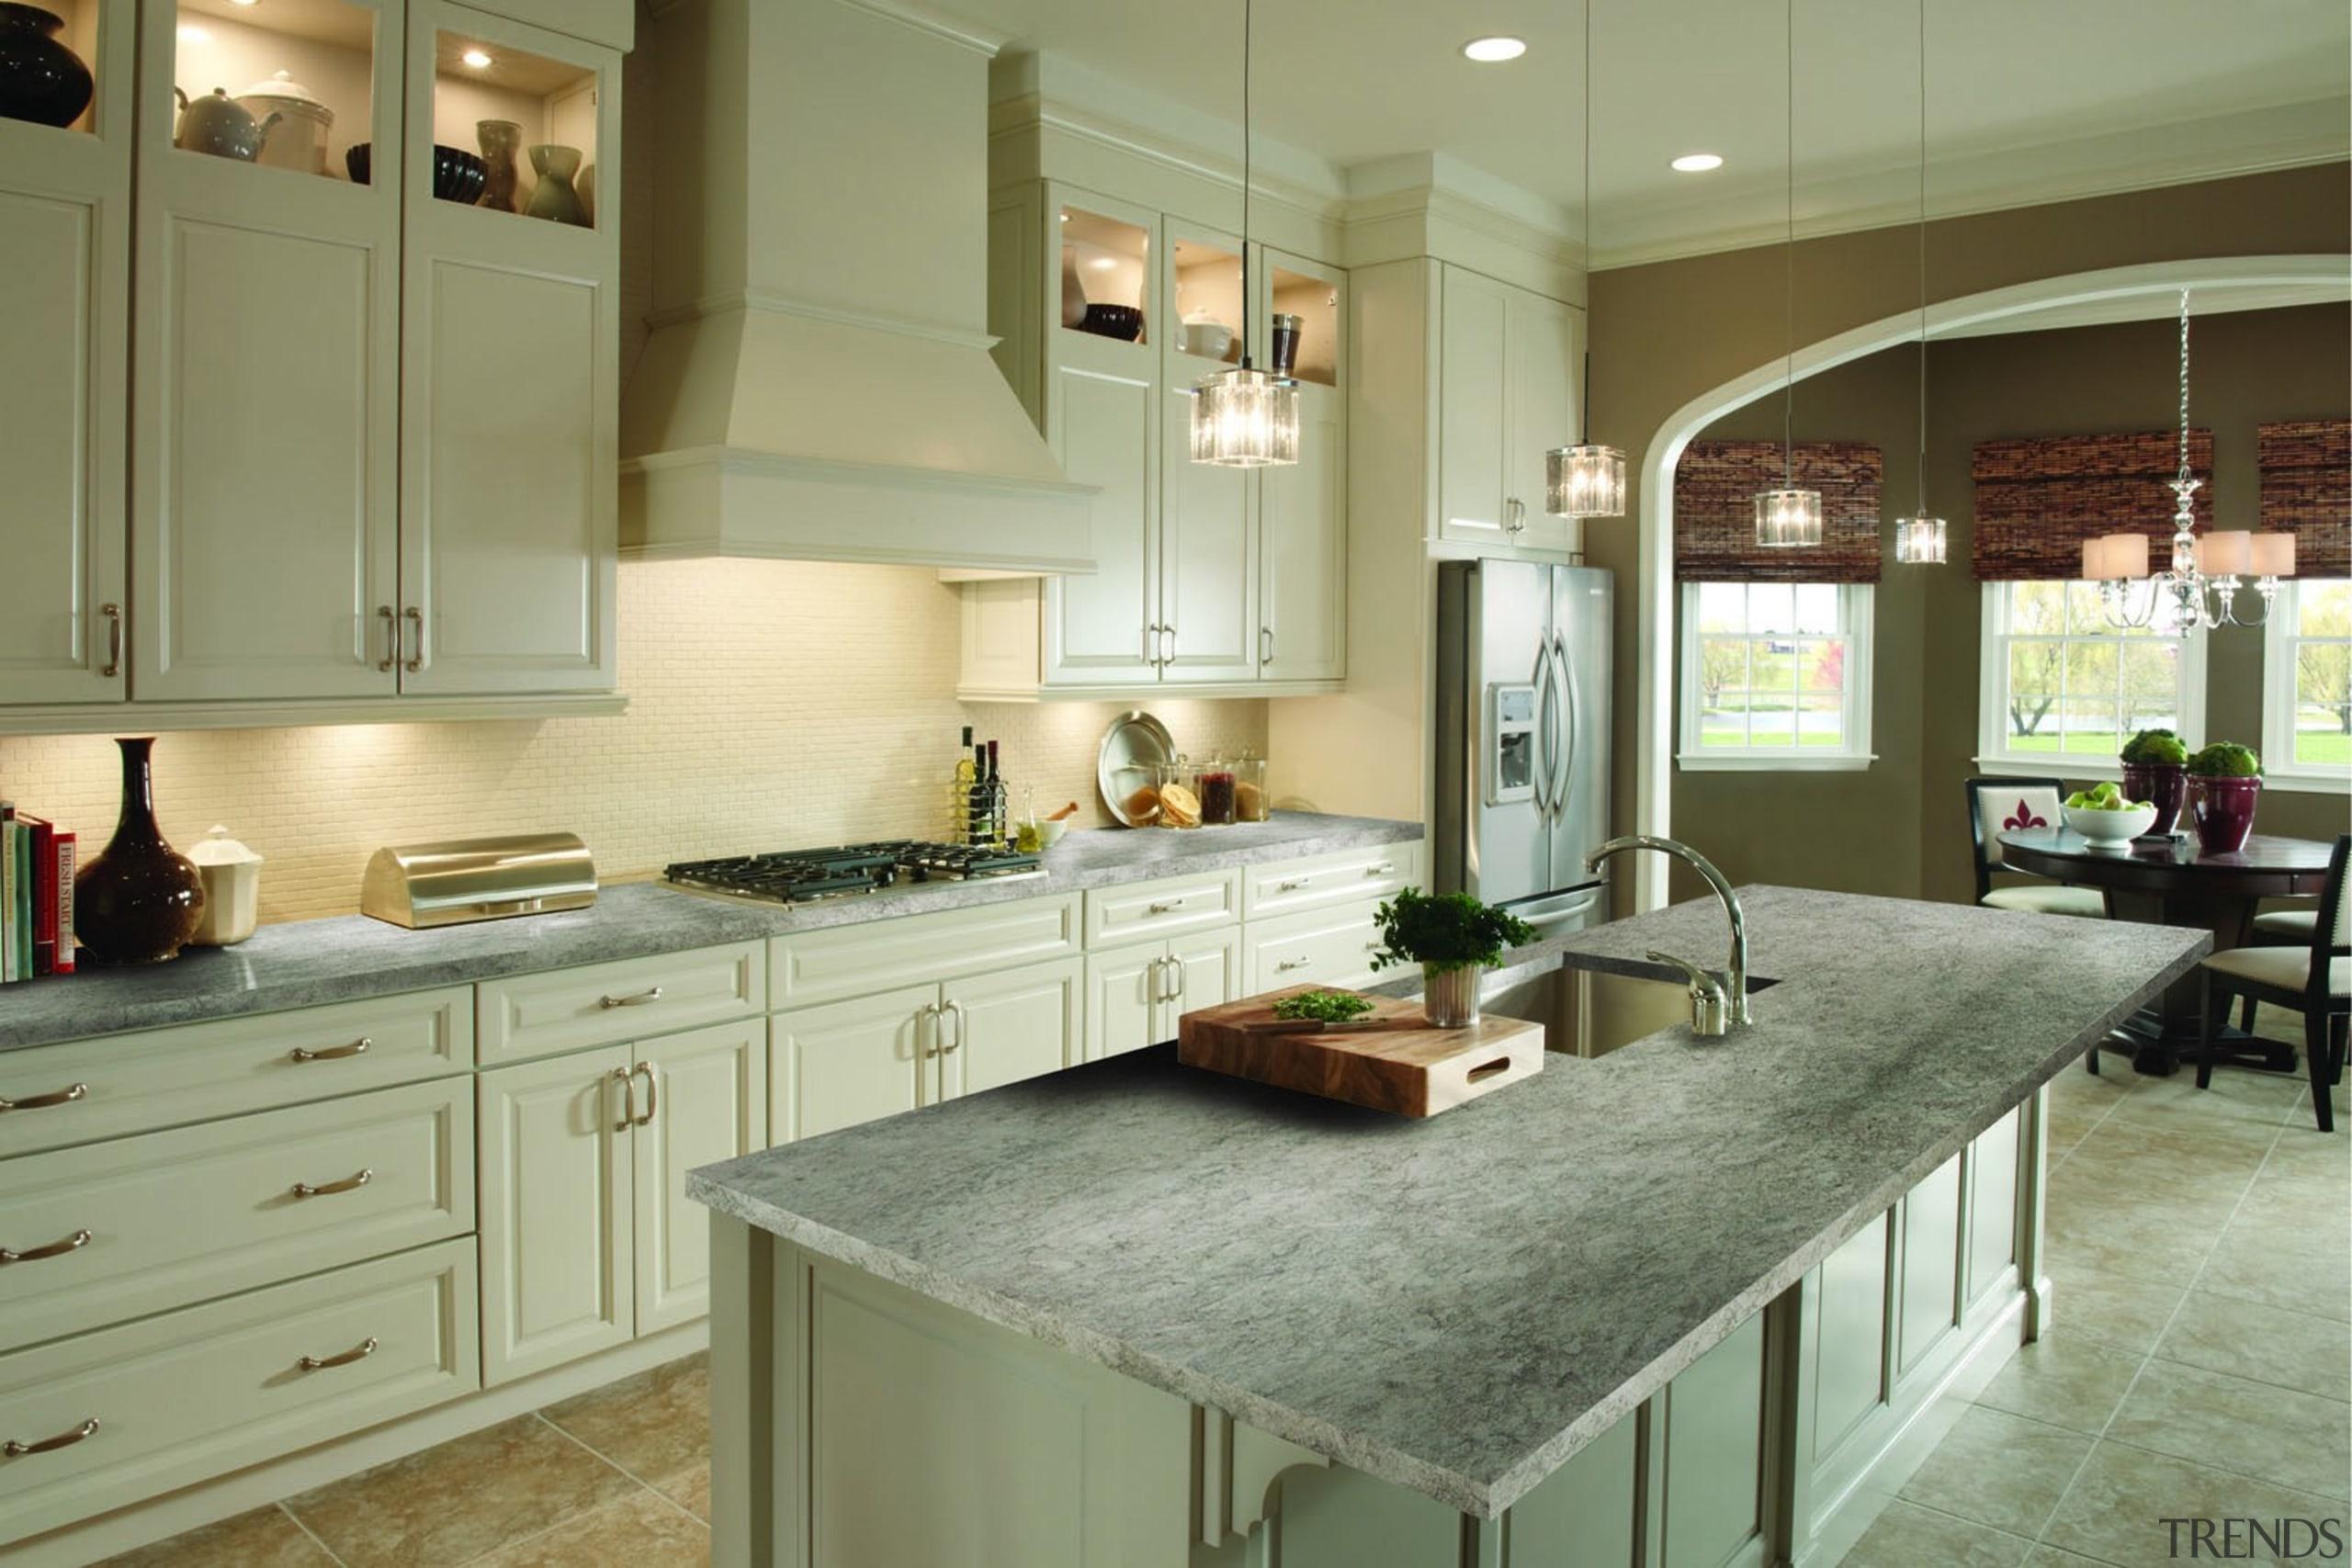 VEGHA KITCHENv 2 - VEGHA KITCHENv 2 - cabinetry, countertop, cuisine classique, flooring, home, interior design, kitchen, room, green, brown